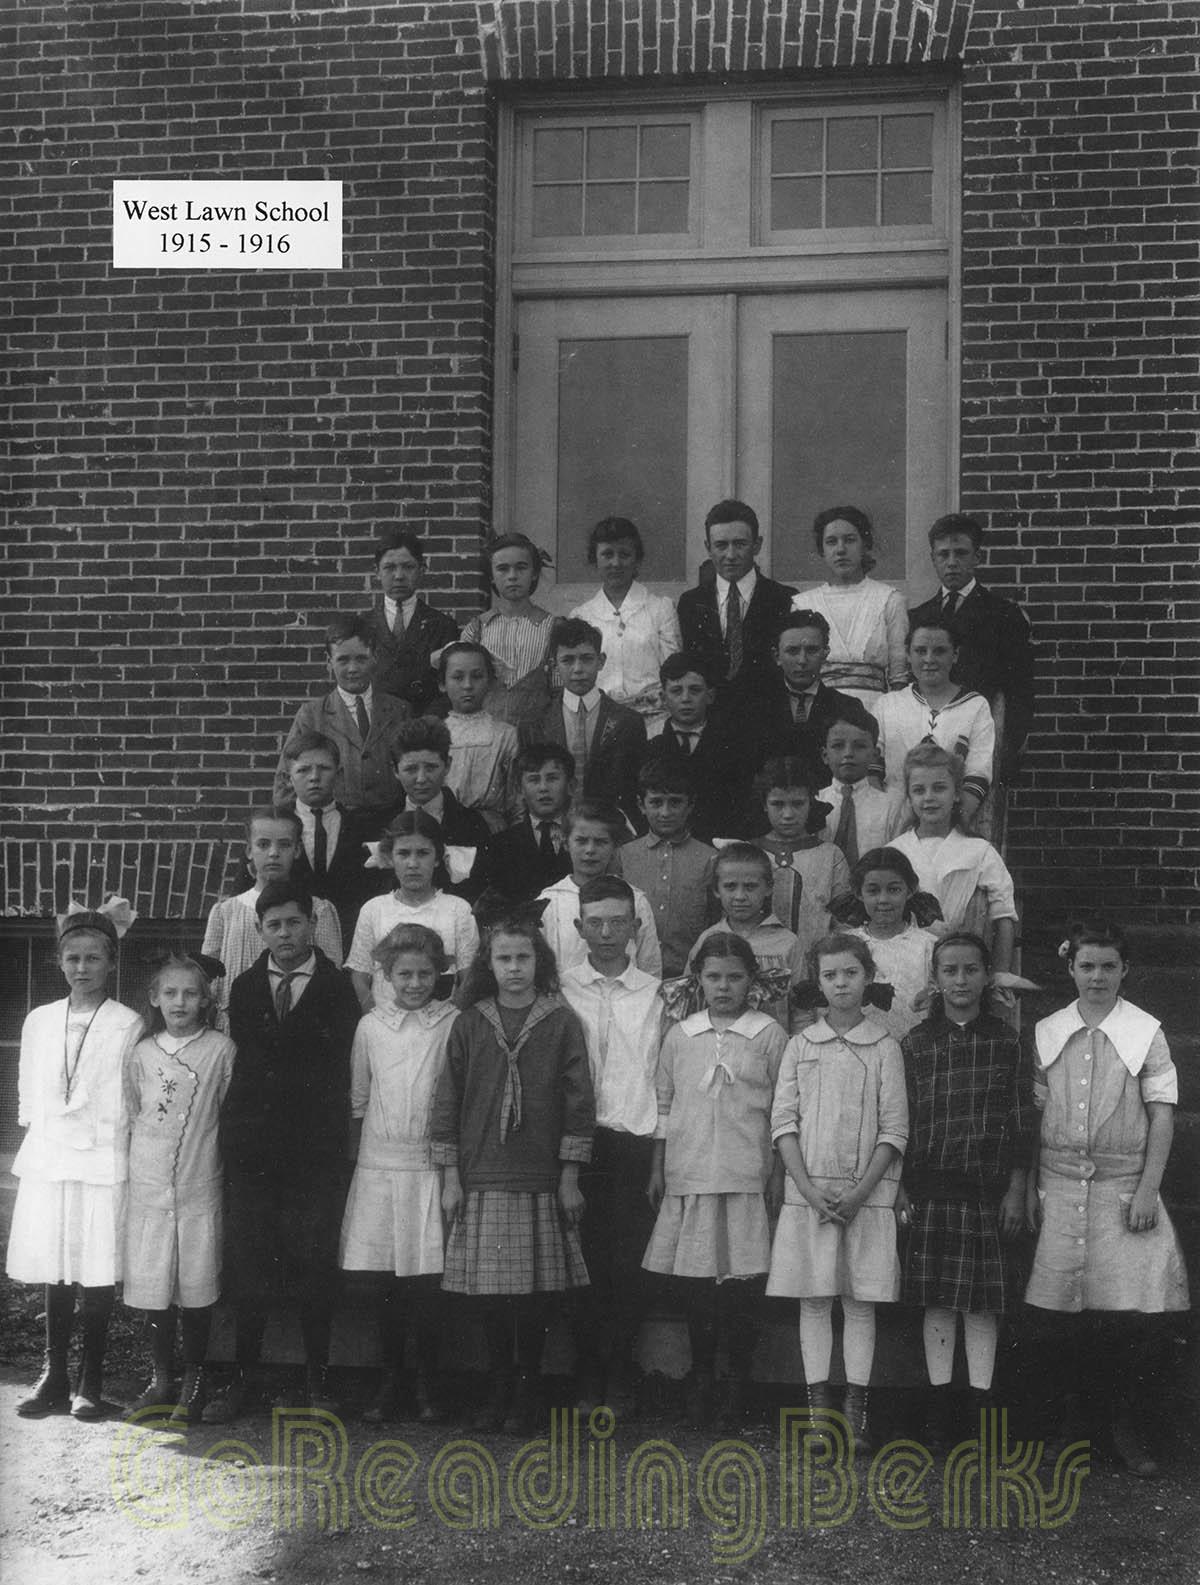 West Lawn School, 1915-1916